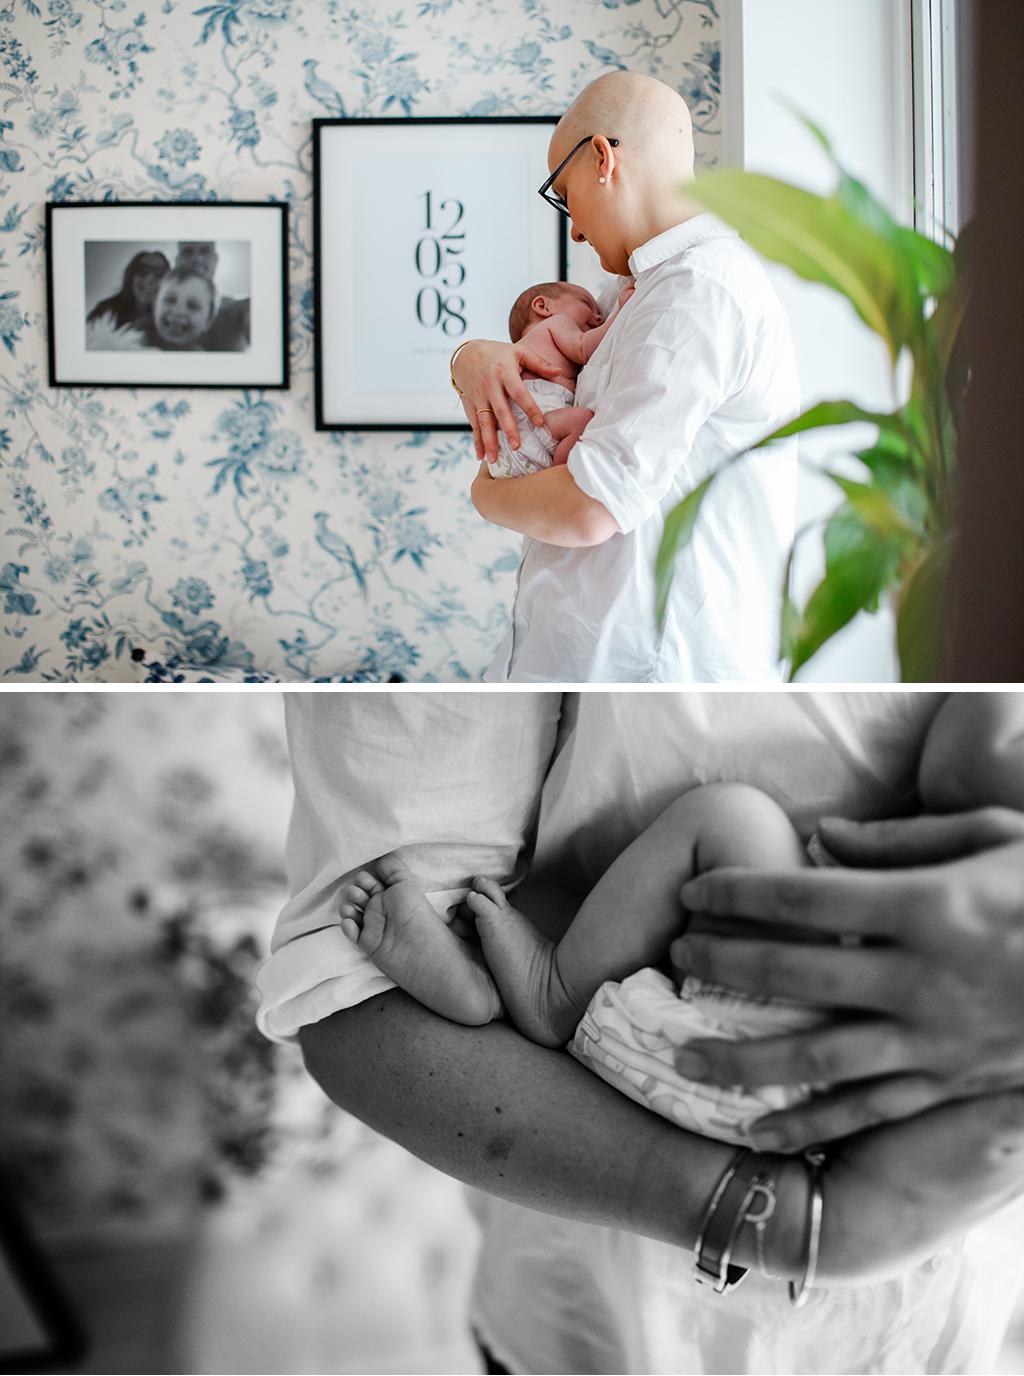 Lifestyle-nyfoddfotografering_newbornphotography_familjefotograf_Stockholm.jpg